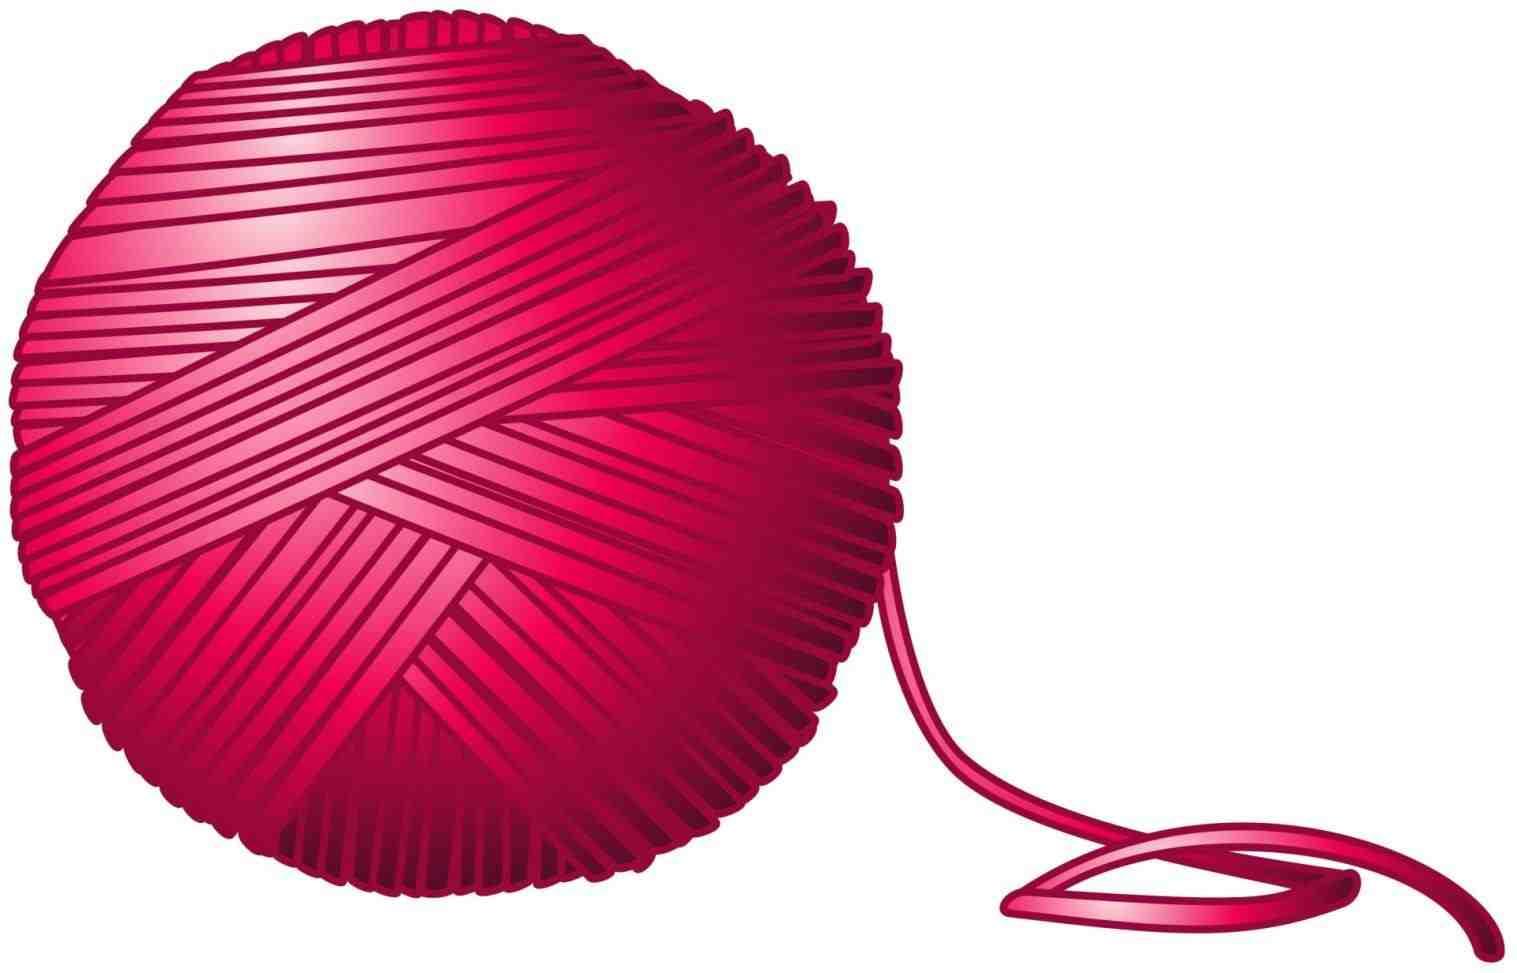 1517x973 Ball Of Yarn Clip Art Igreatmall